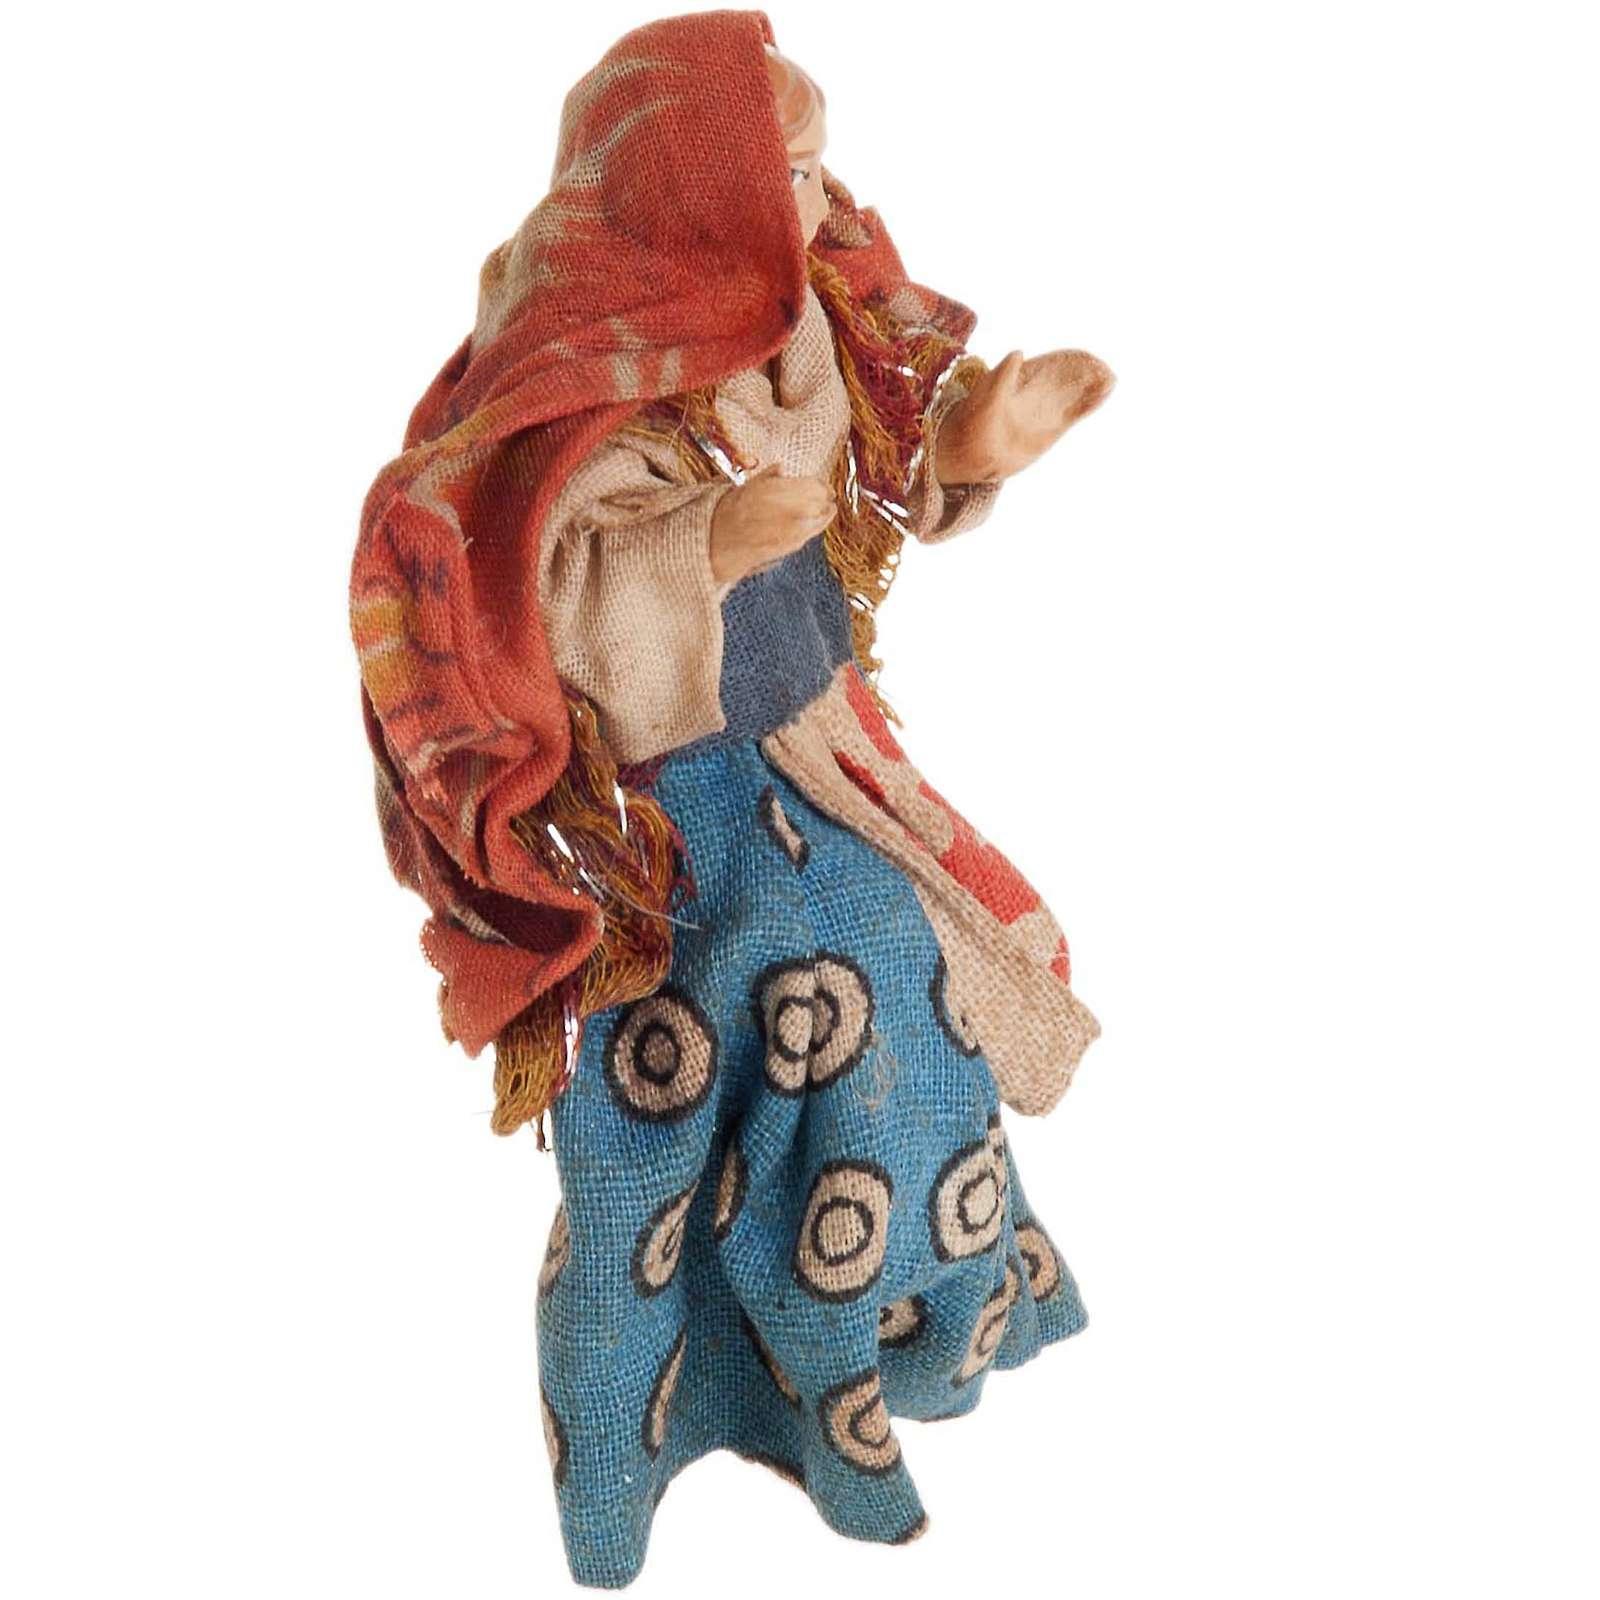 Mujer sentada 8 cm. belén napolitano 4